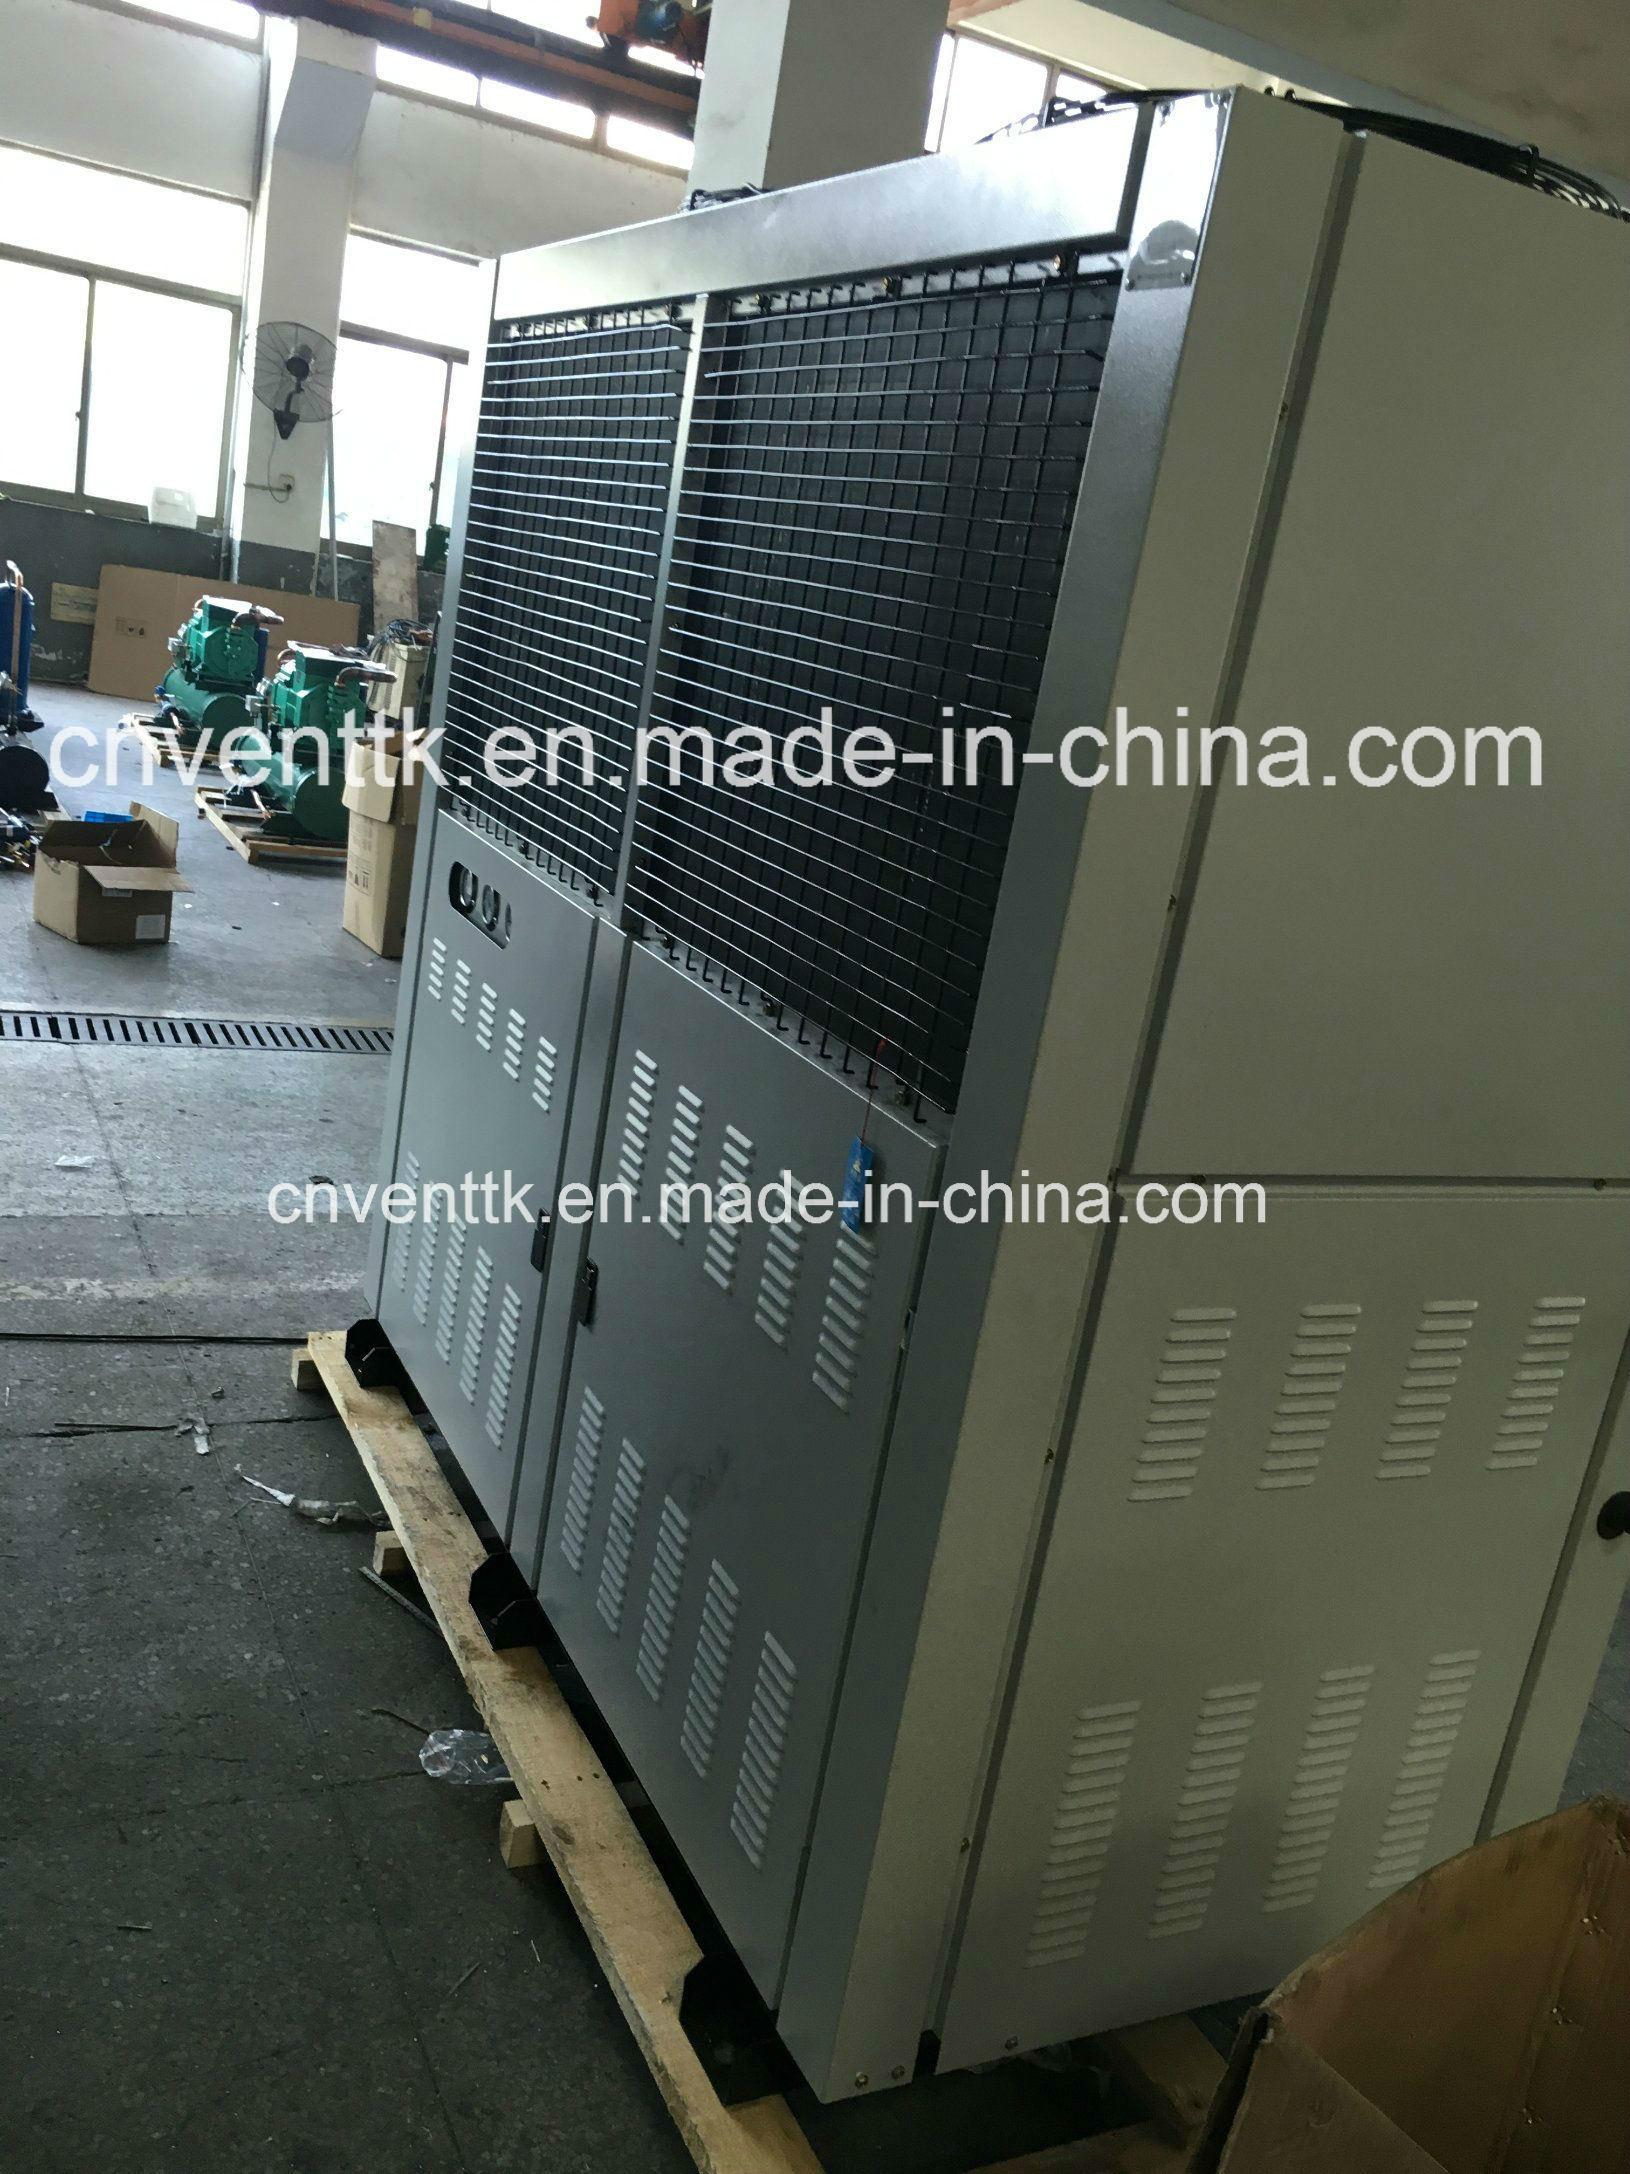 2017 Hotsale V Type Air Condenser Refrigeration Condensing Unit